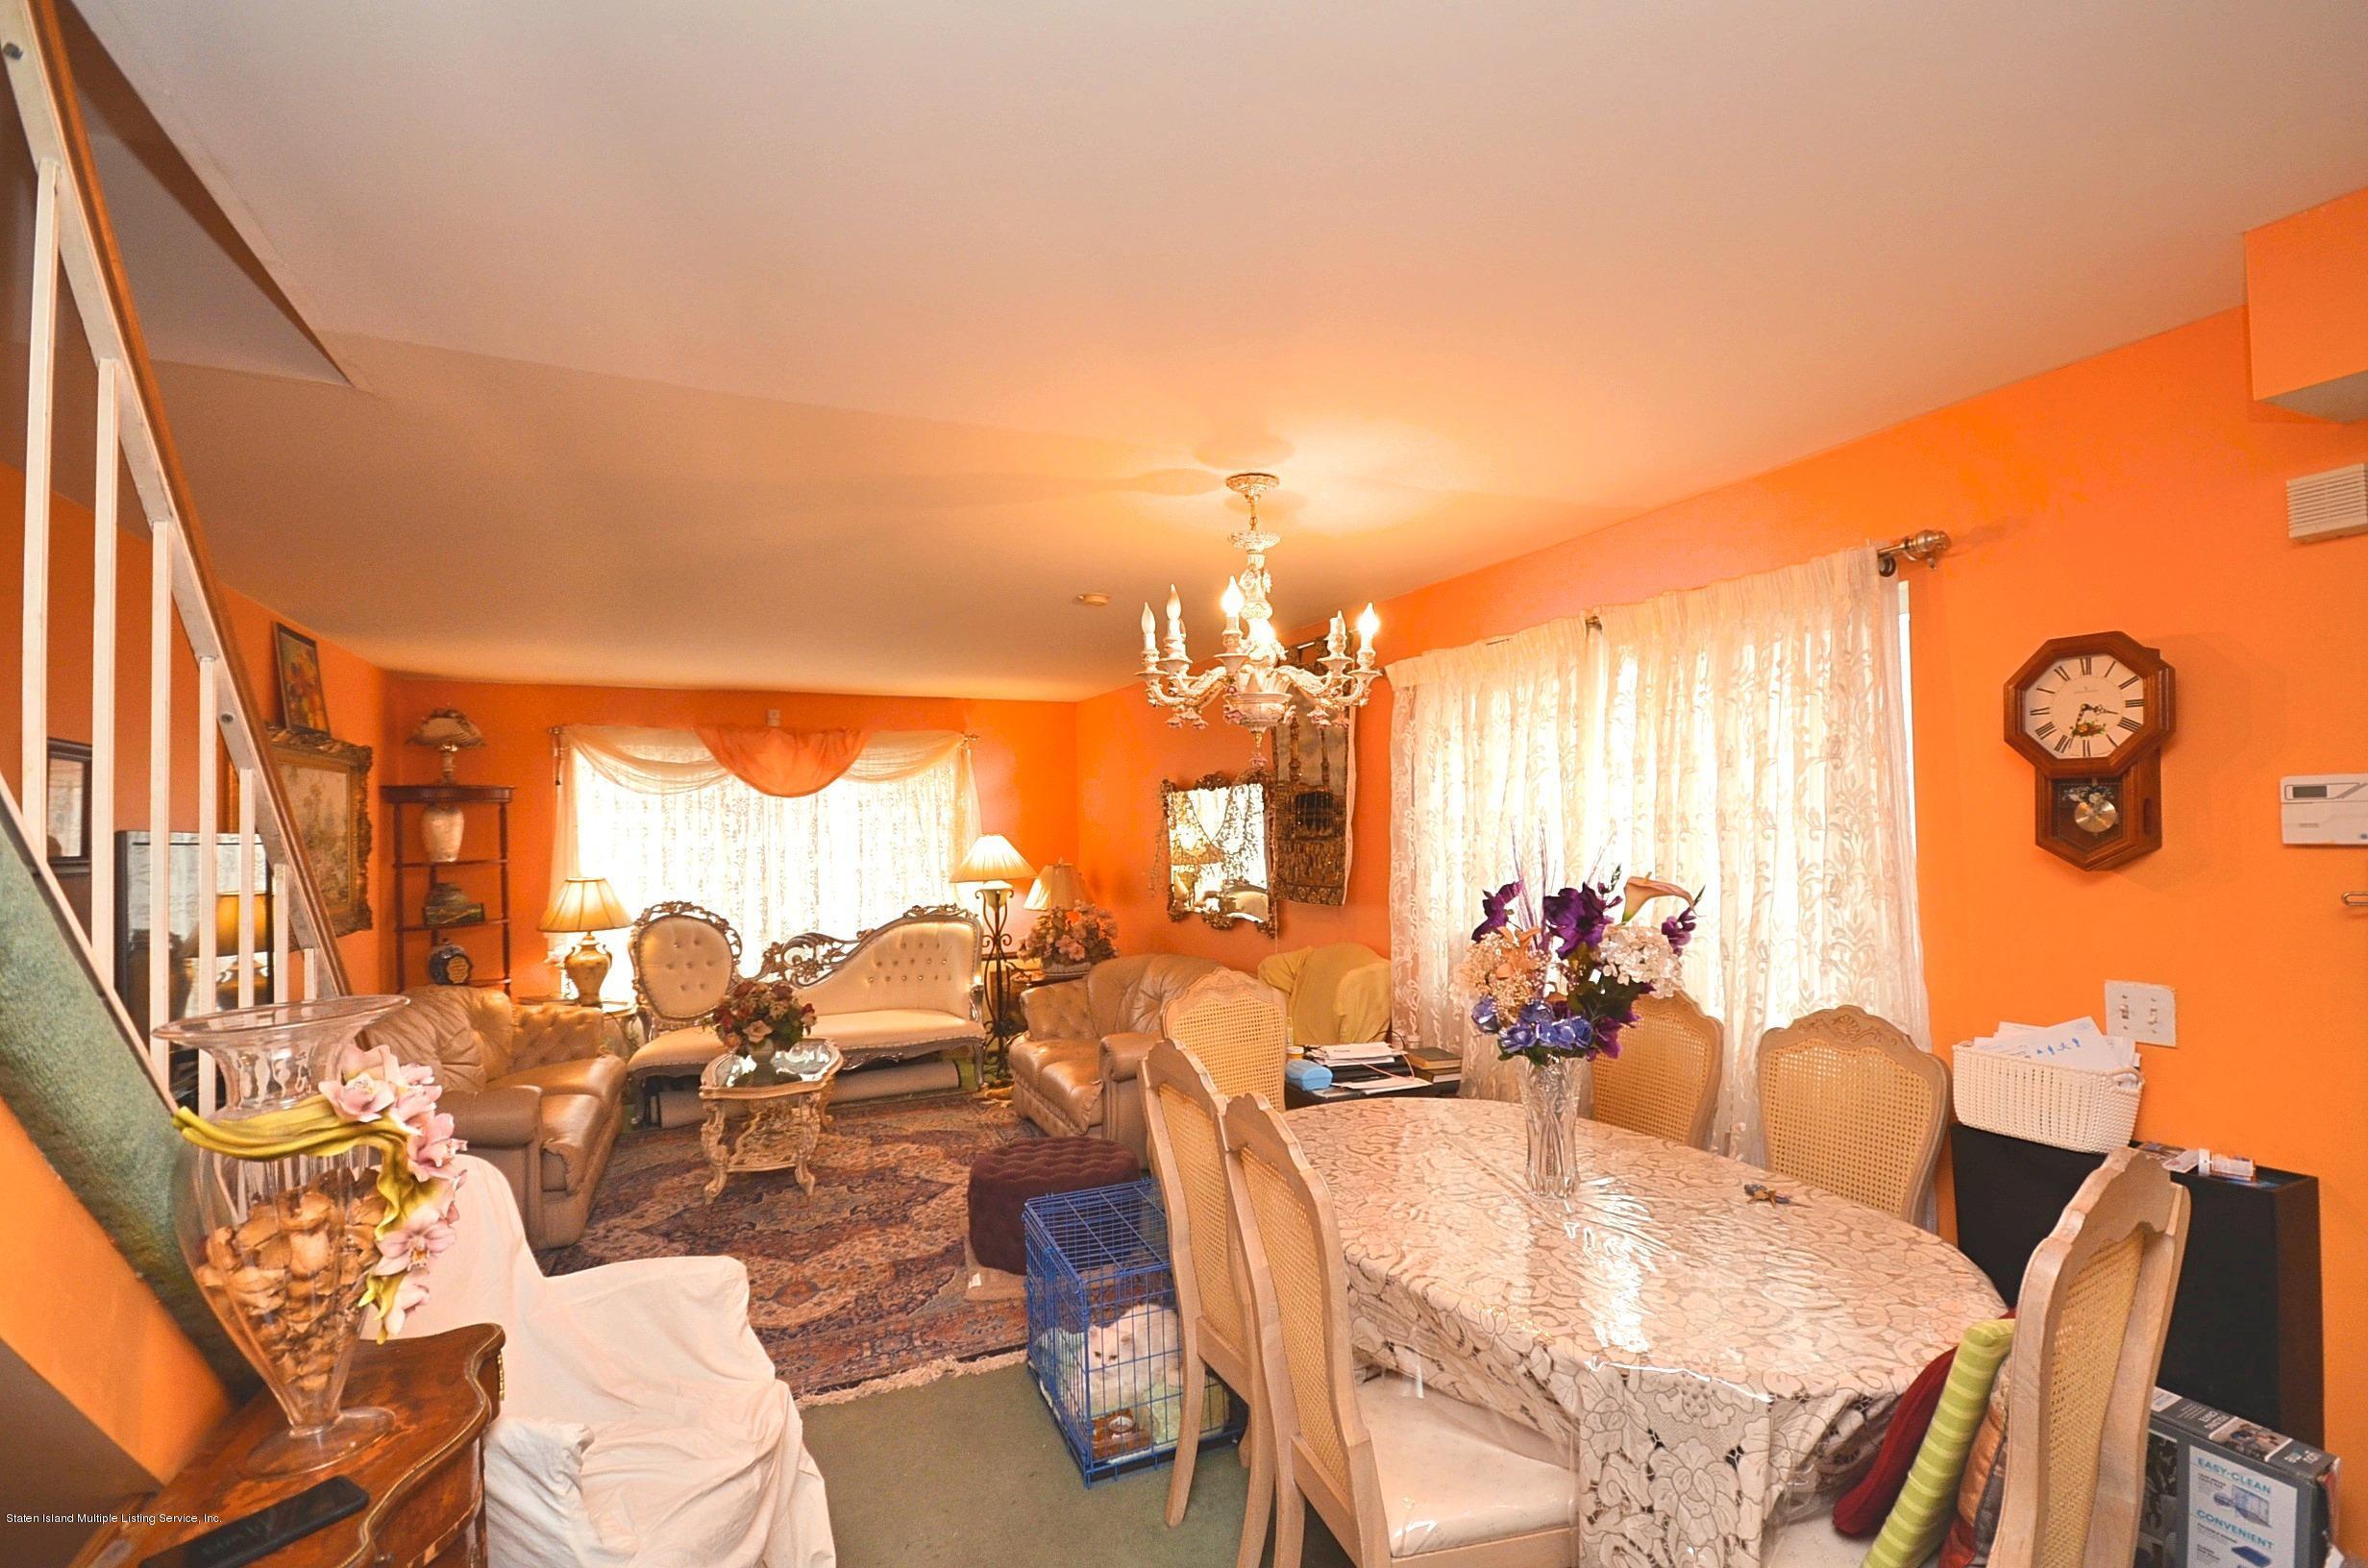 Single Family - Attached 200 Kenilworth Avenue  Staten Island, NY 10312, MLS-1124636-2